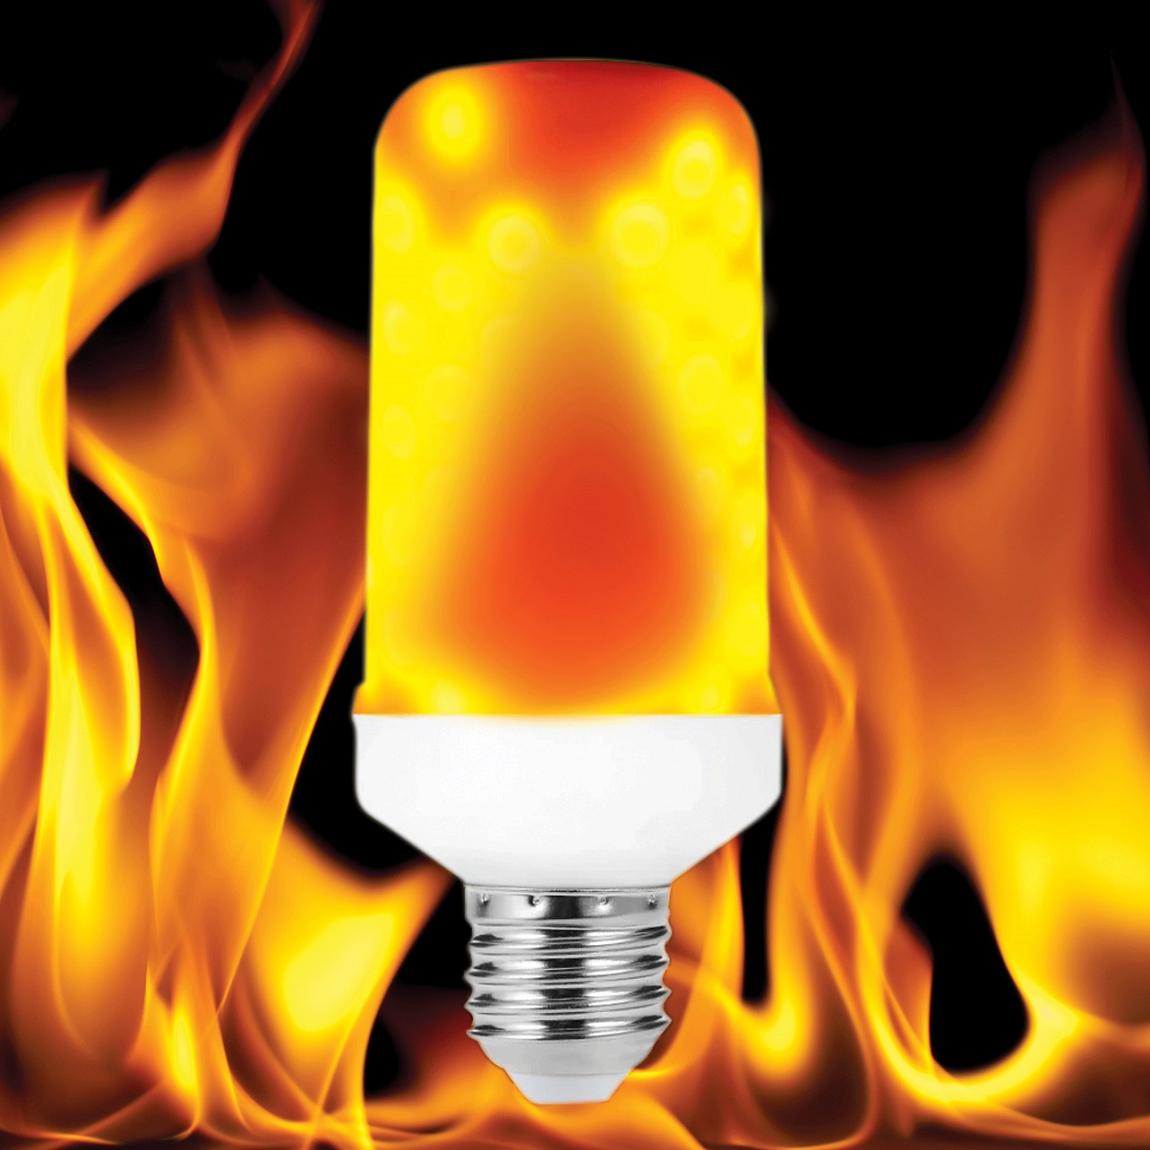 FORLIFE FL-1235 - 4 Watt Alev Efektli LED Ampul